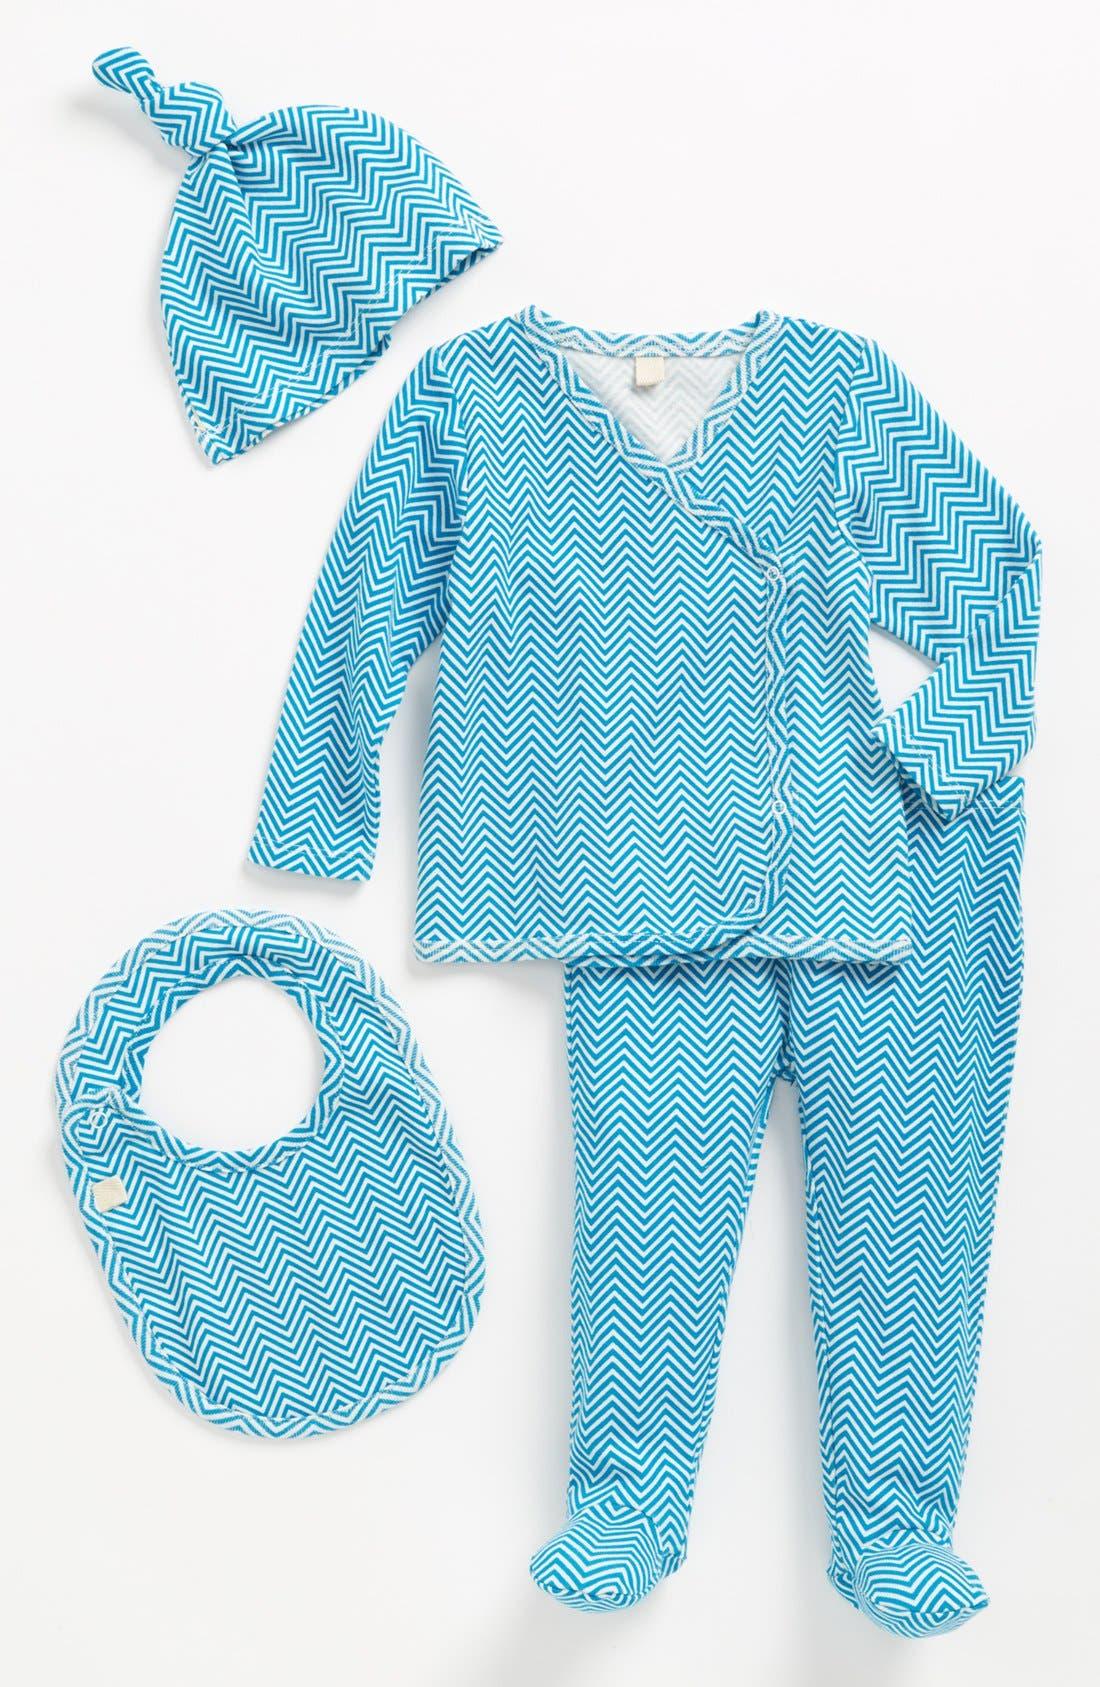 Main Image - Stem Baby Organic Cotton Chevron Print Shirt, Pants, Hat & Bib (Baby Boys)